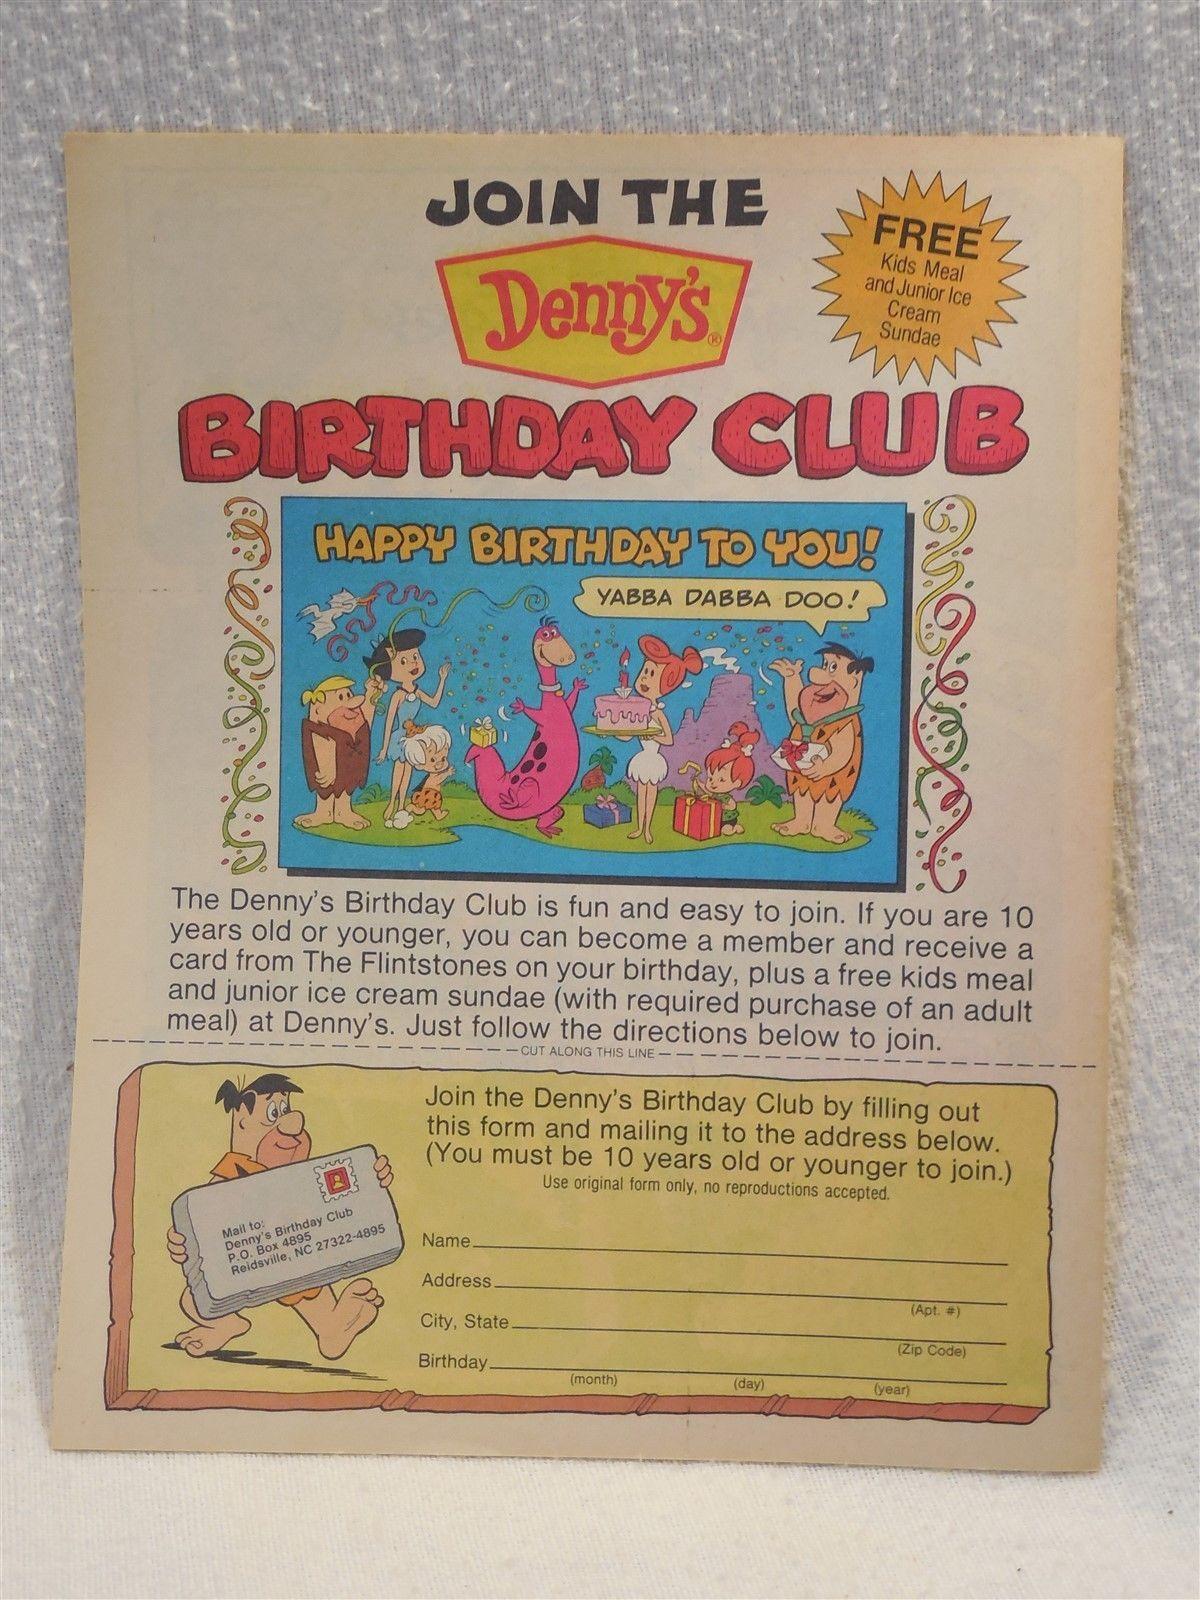 Flintstones 1990 Denny's Unused Fun Book - Comics, Puzzles, Games - Volume 15